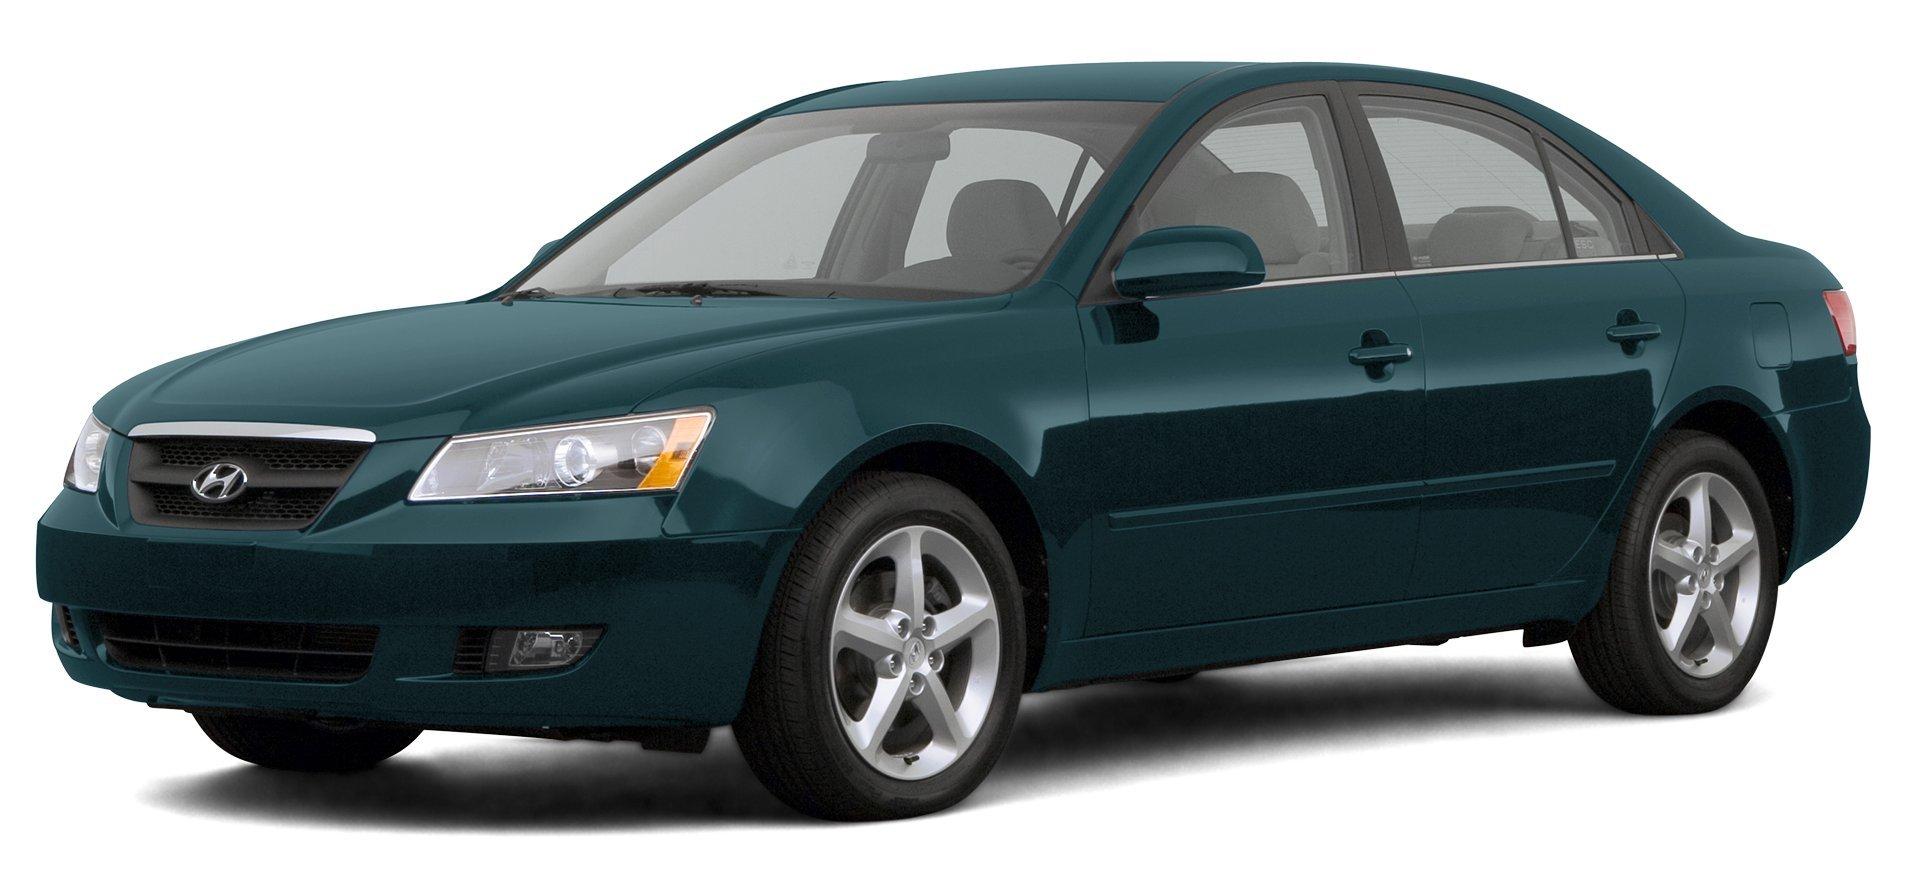 Amazoncom 2007 Chevrolet Impala Reviews Images and Specs Vehicles